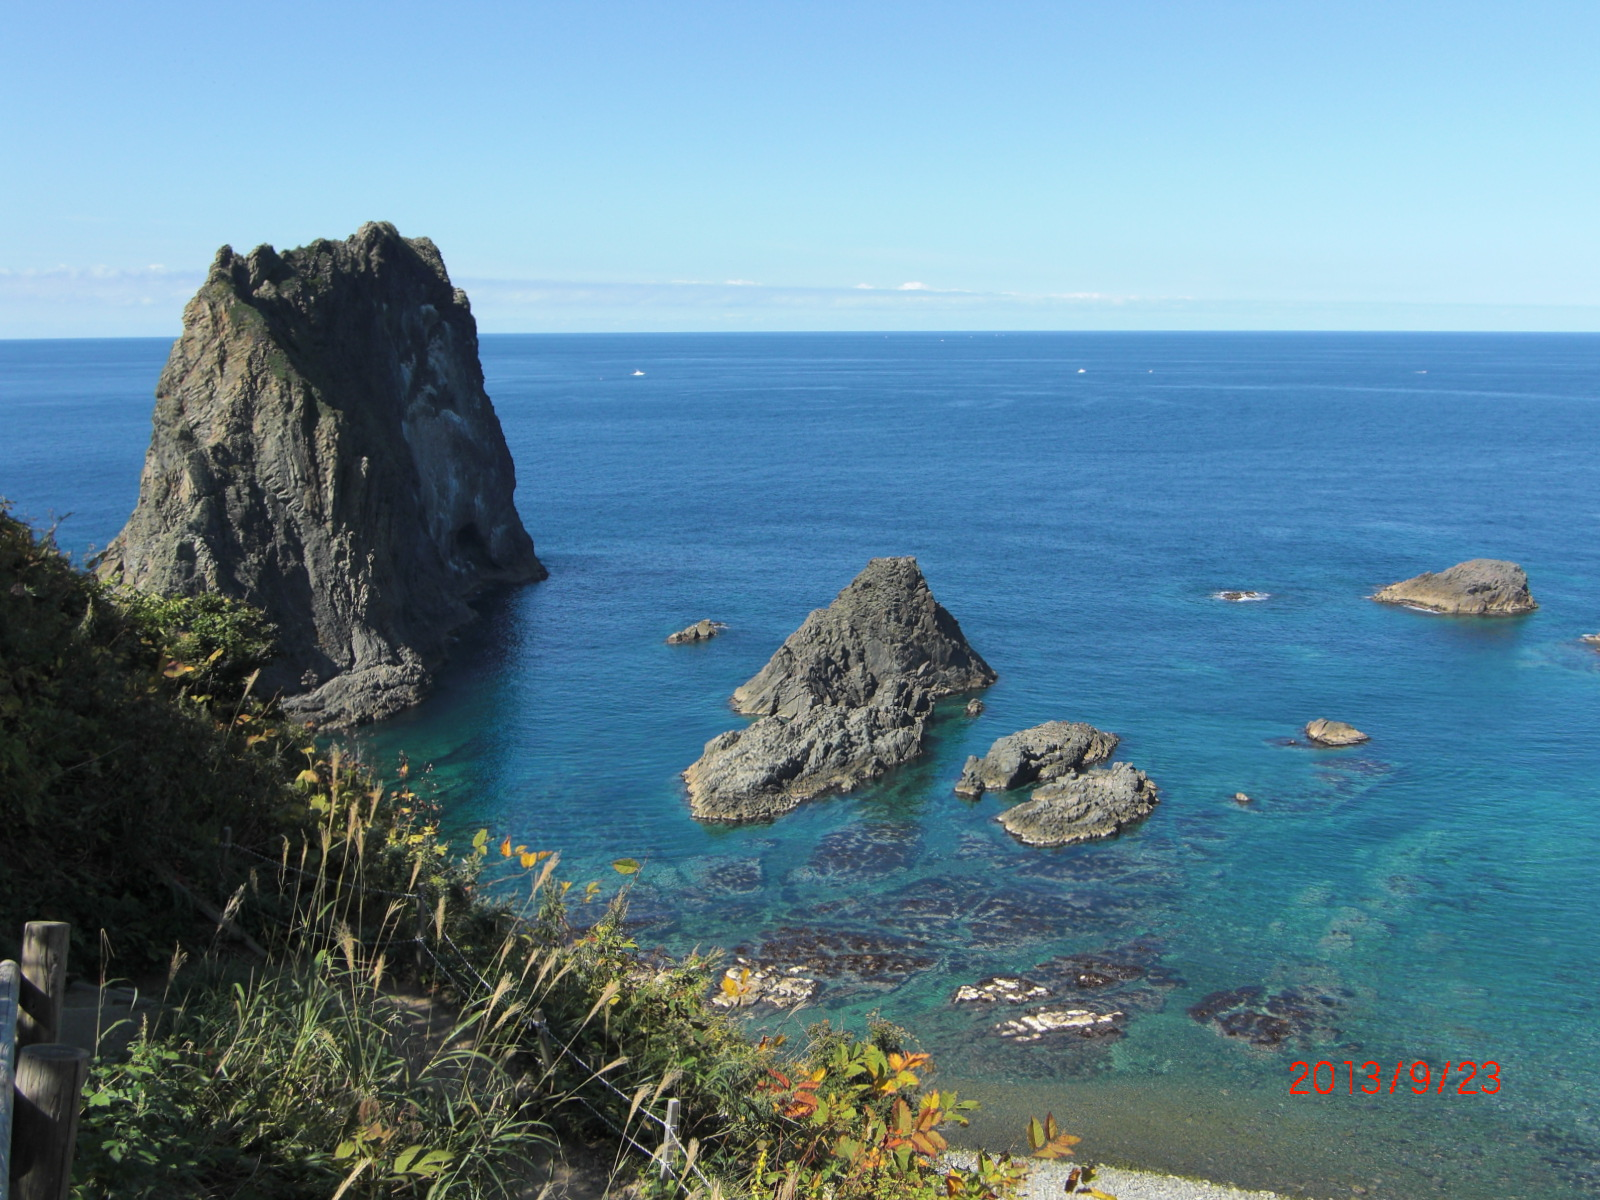 【積丹】島武意海岸・積丹岬観光案内です。